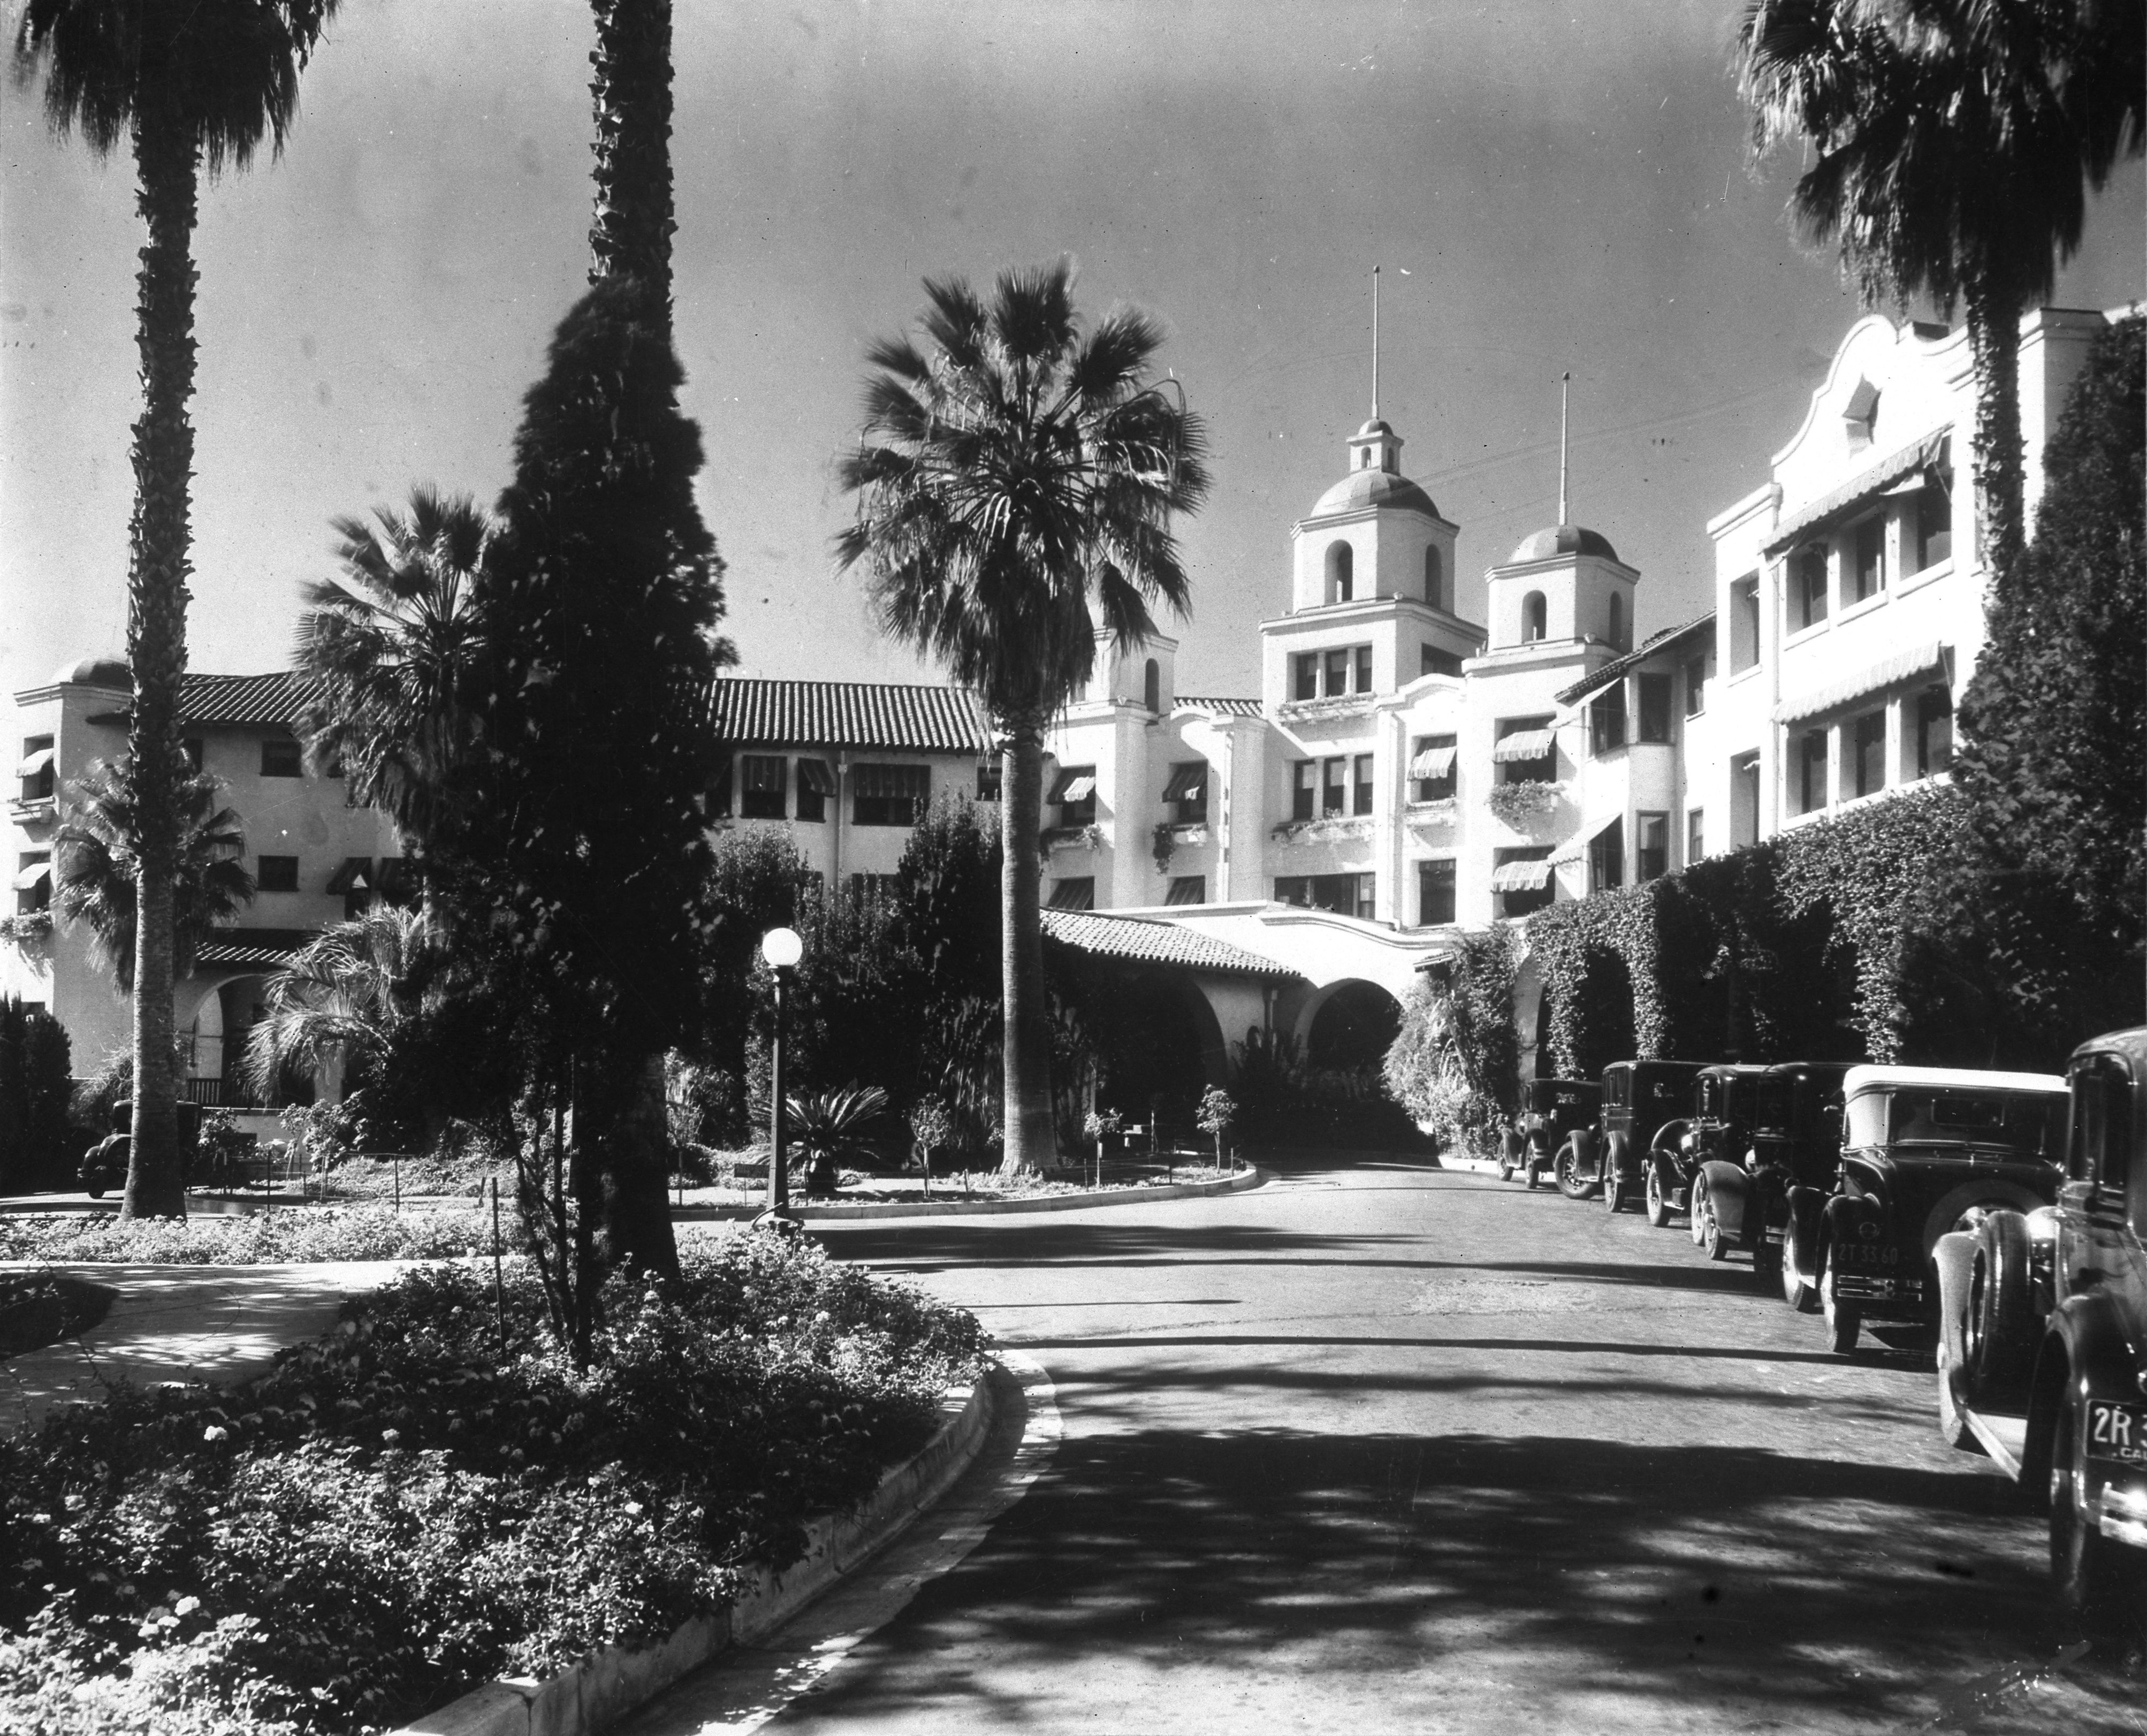 Hotels Los Angeles California Near Universal Studios